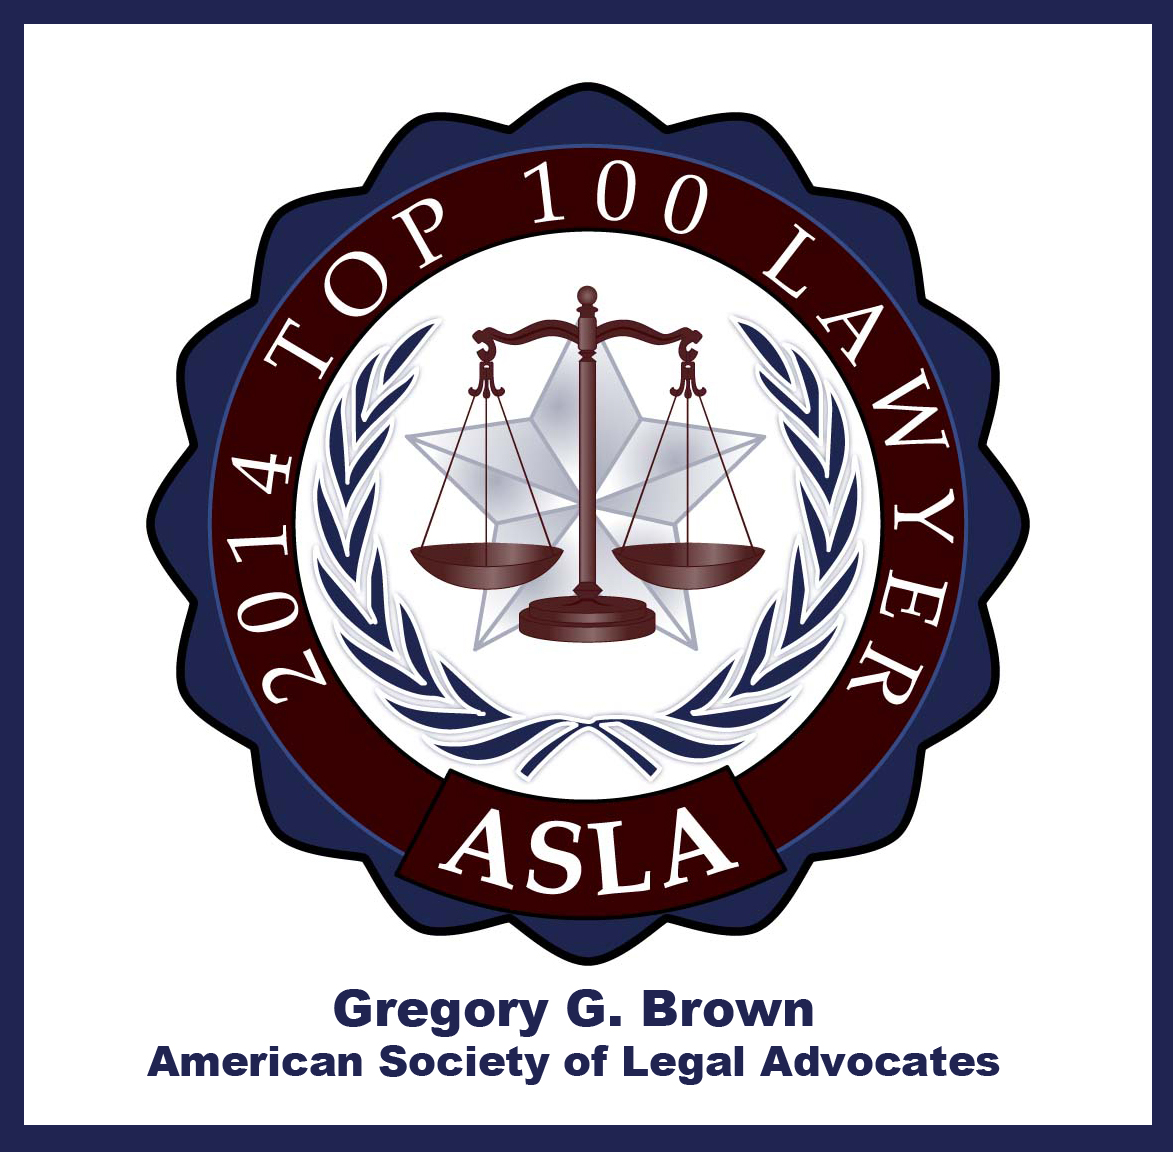 2014 ASLA Top 100 Logo copy.jpg